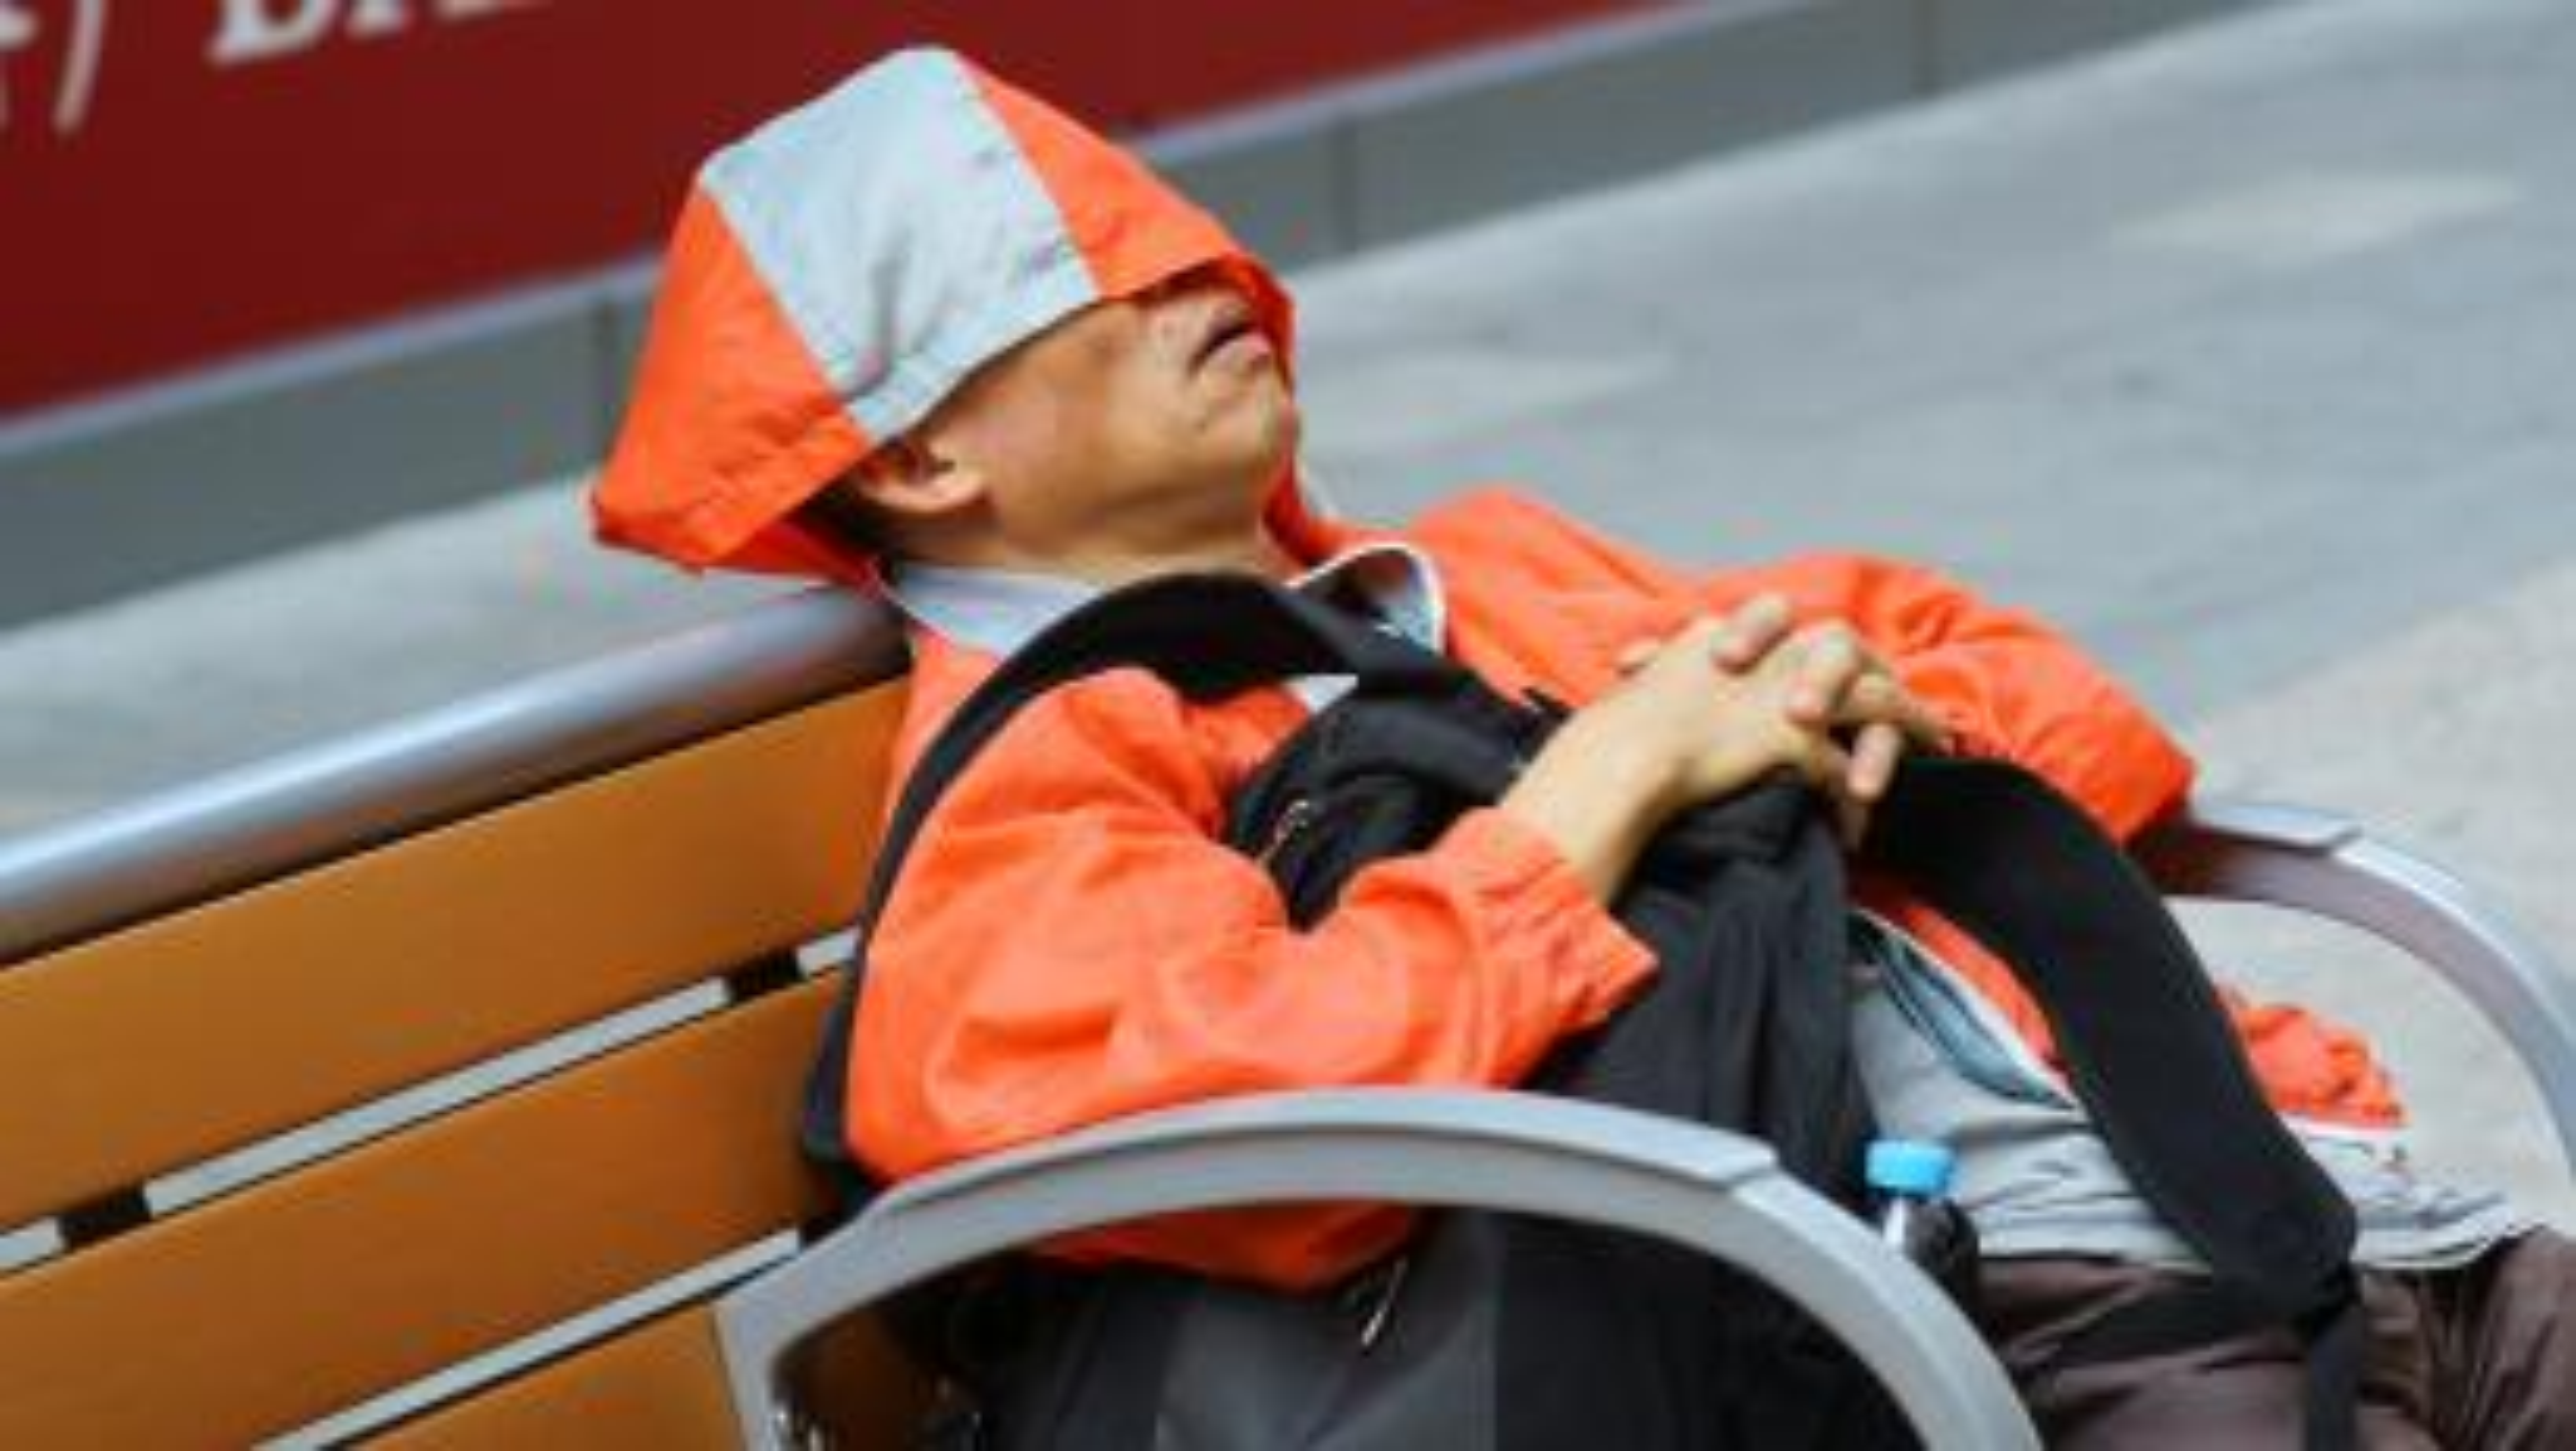 Man in orange jacket asleep on a bench.